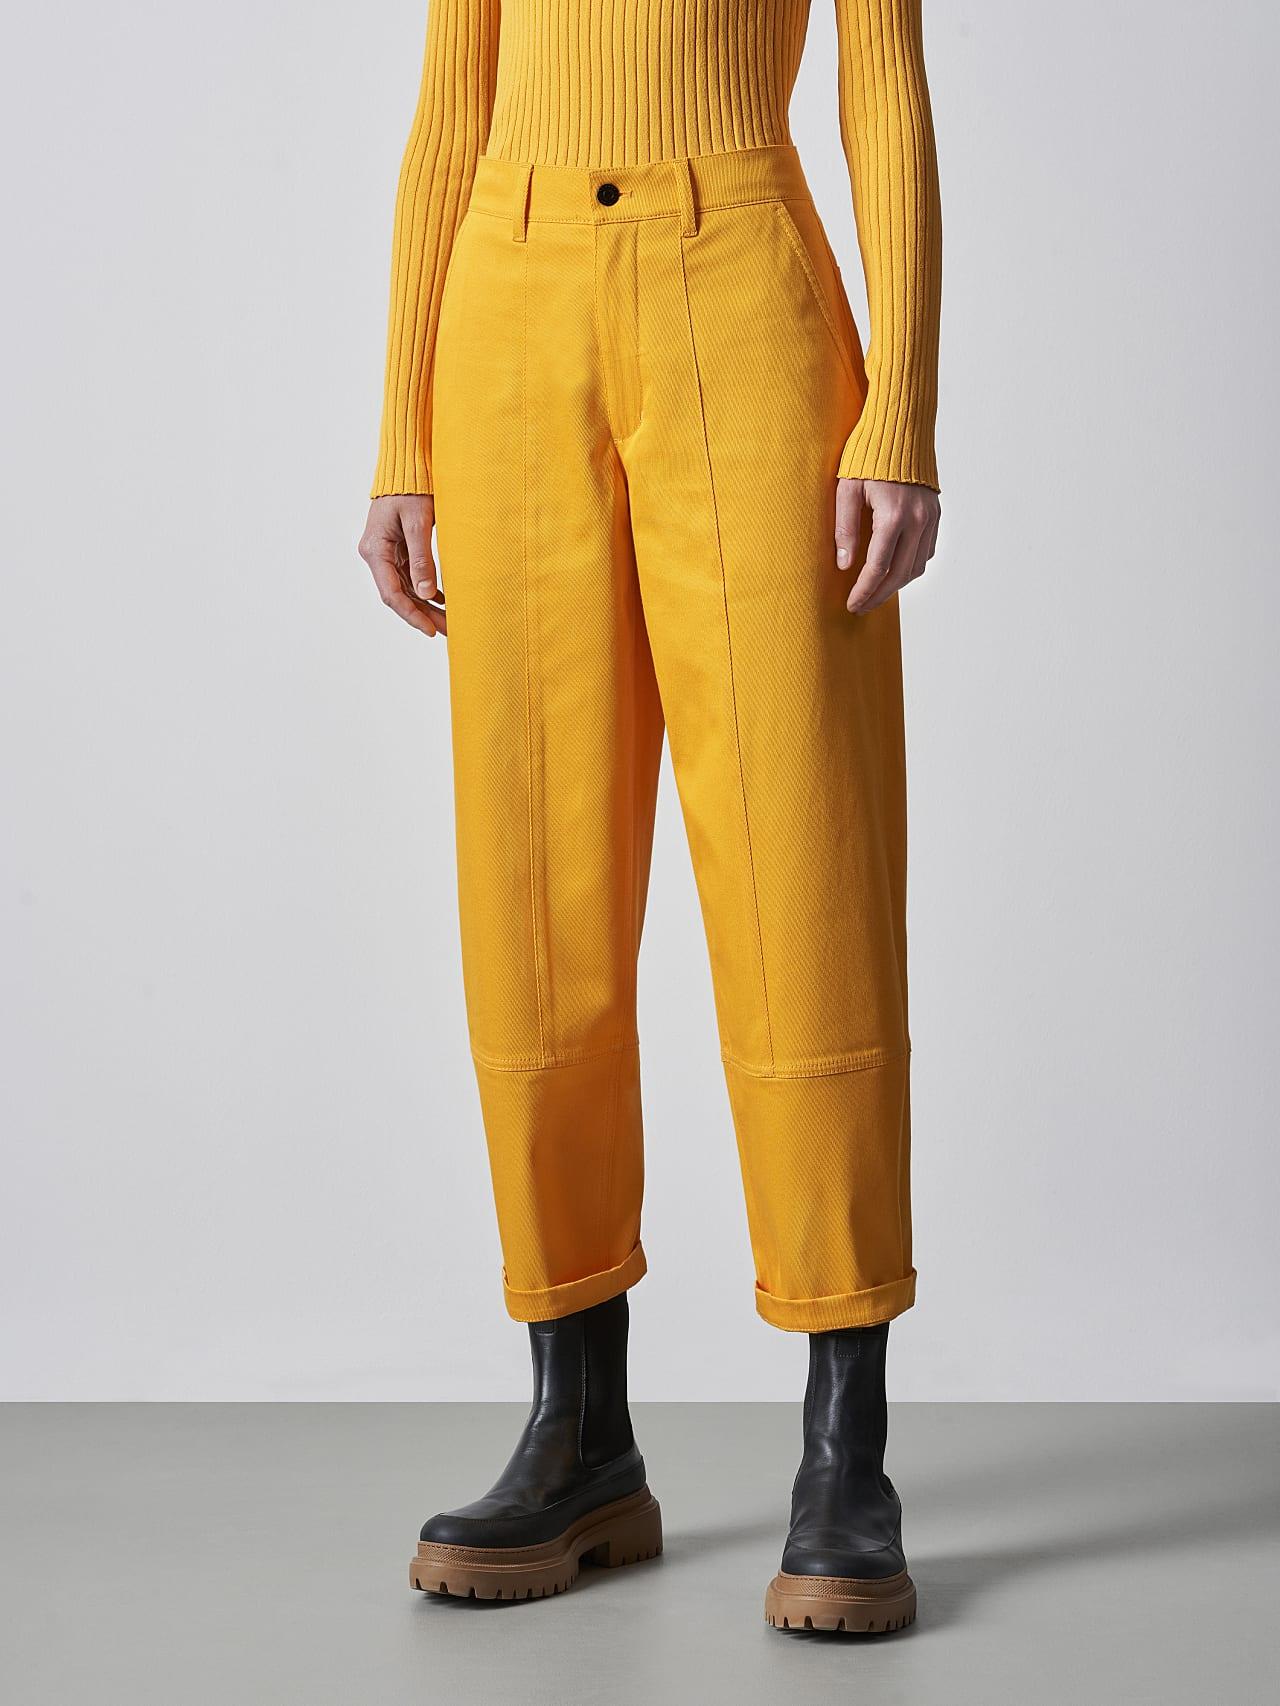 PCHAR V1.Y5.02 Tapered Barrel-Leg Pants yellow Model shot Alpha Tauri